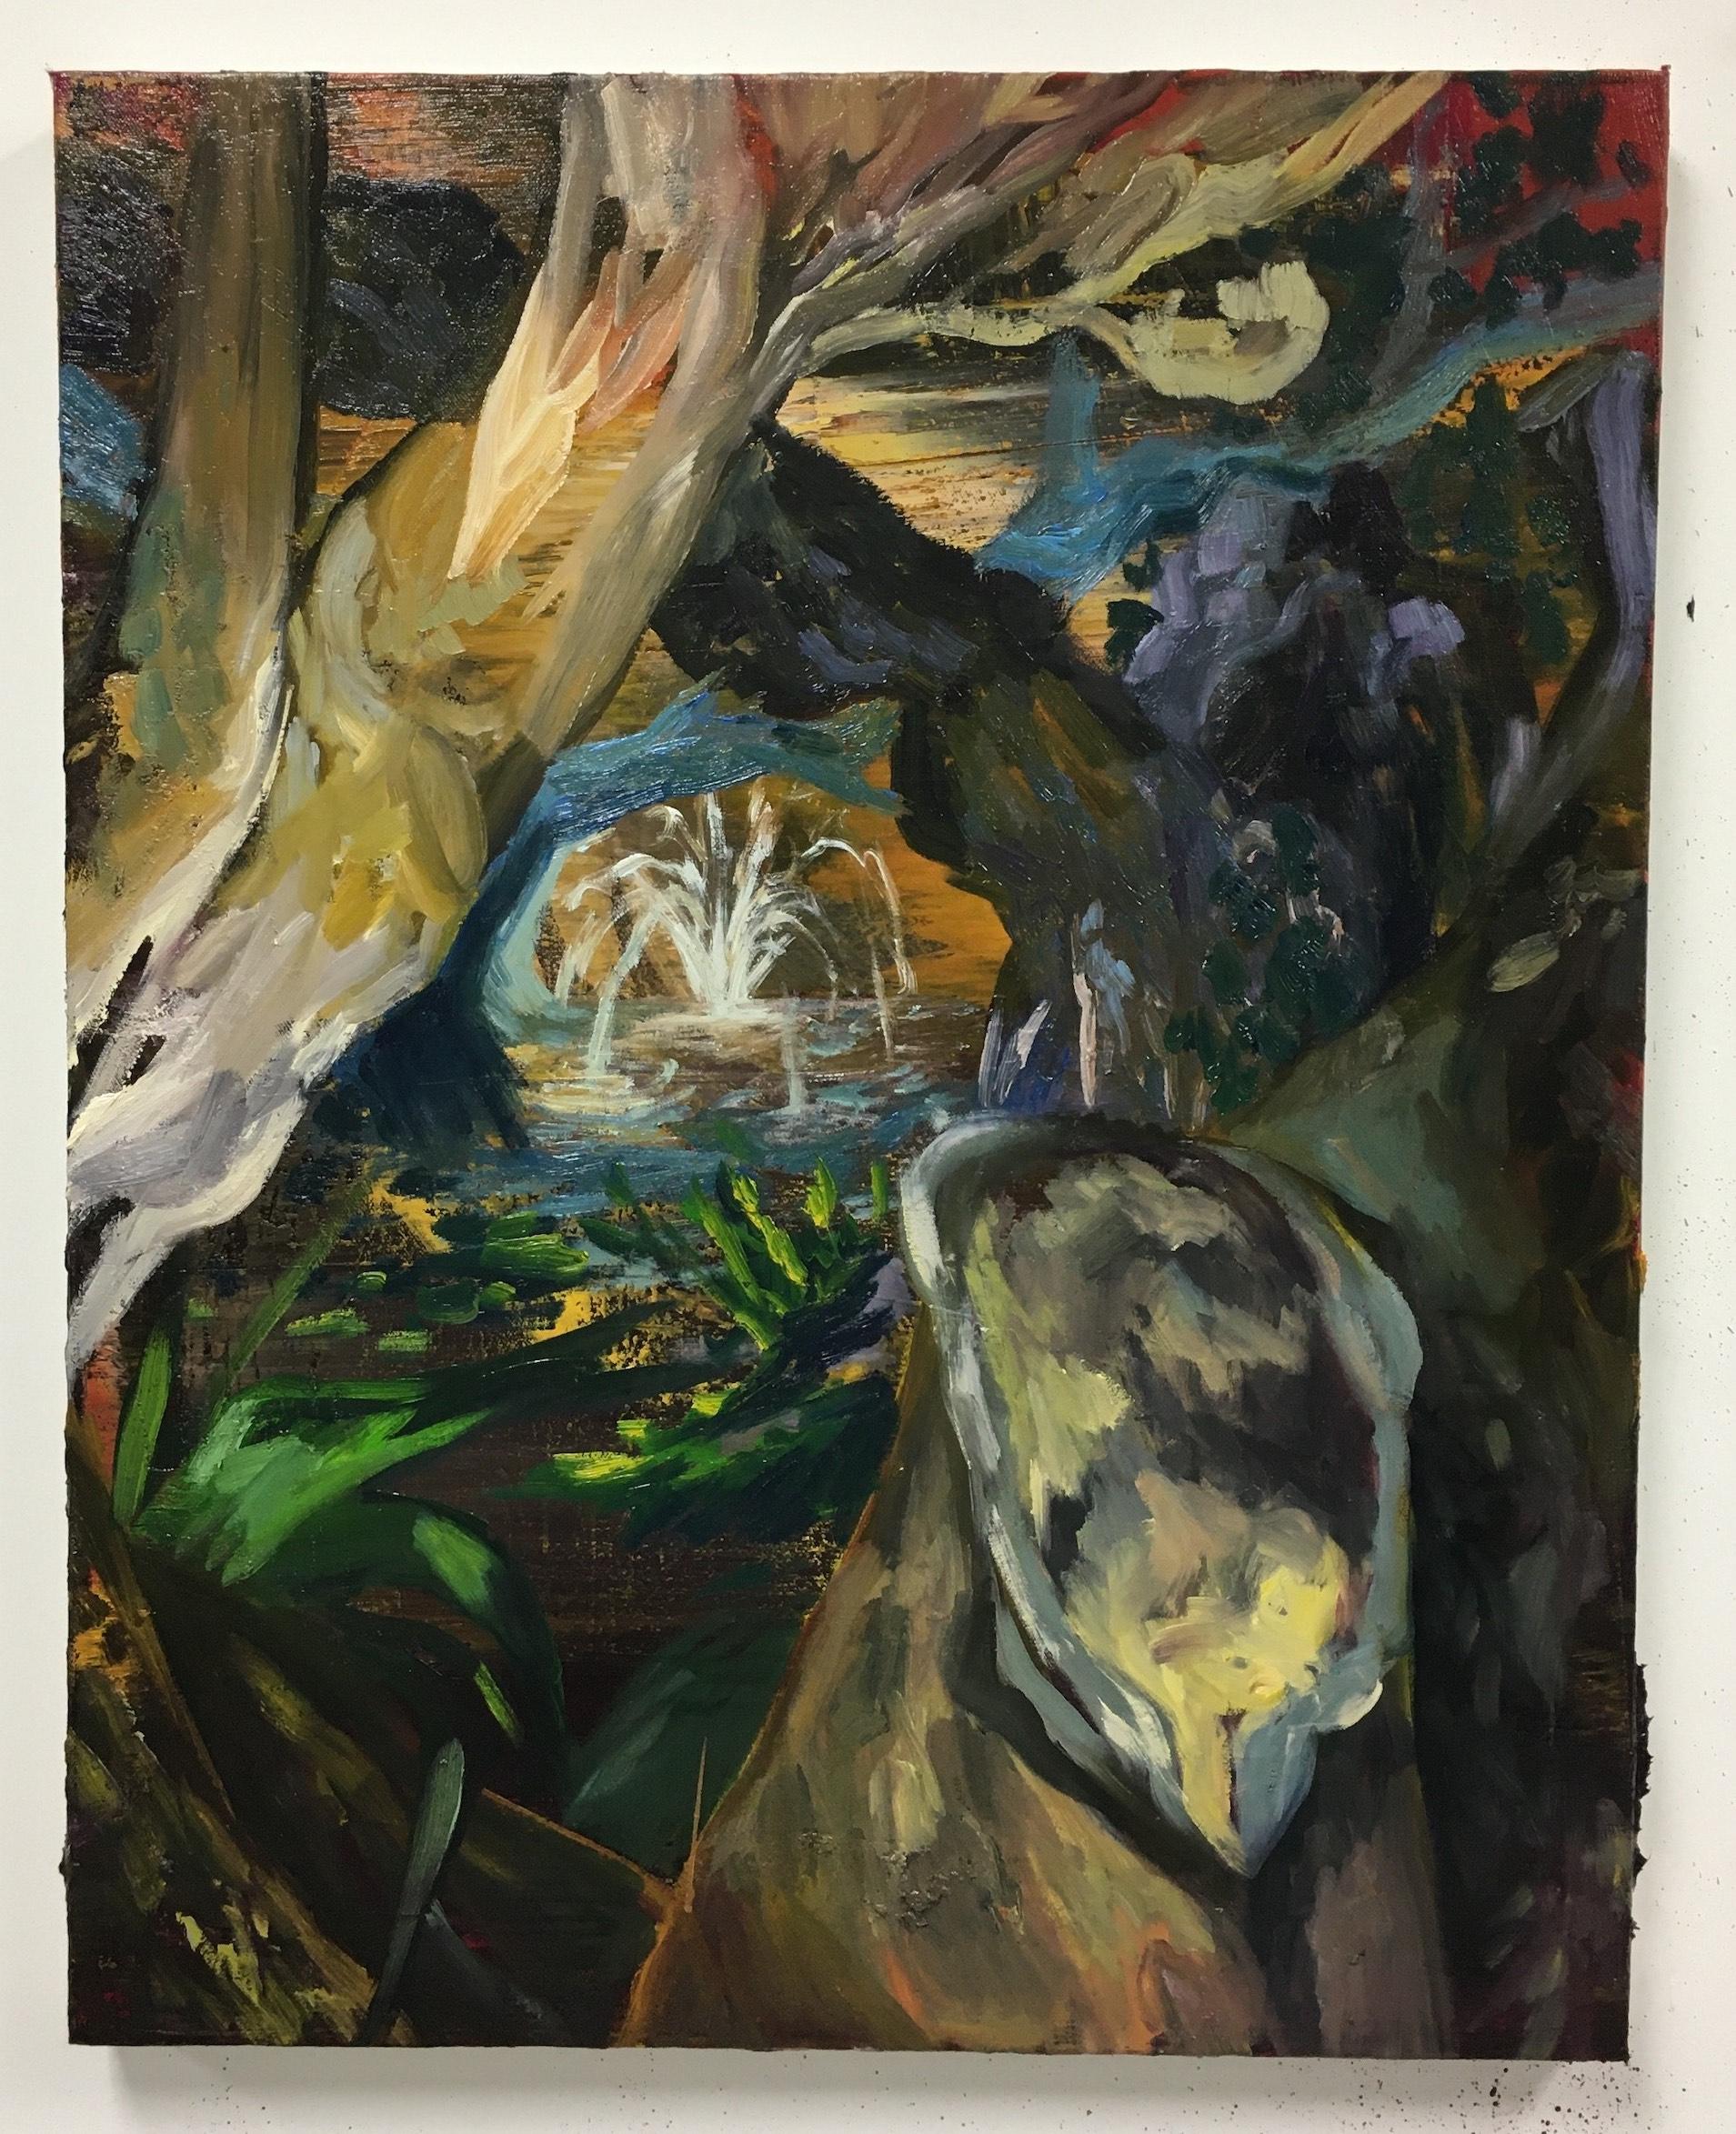 Ernesto Gutierrez Moya, Untitled, 2020